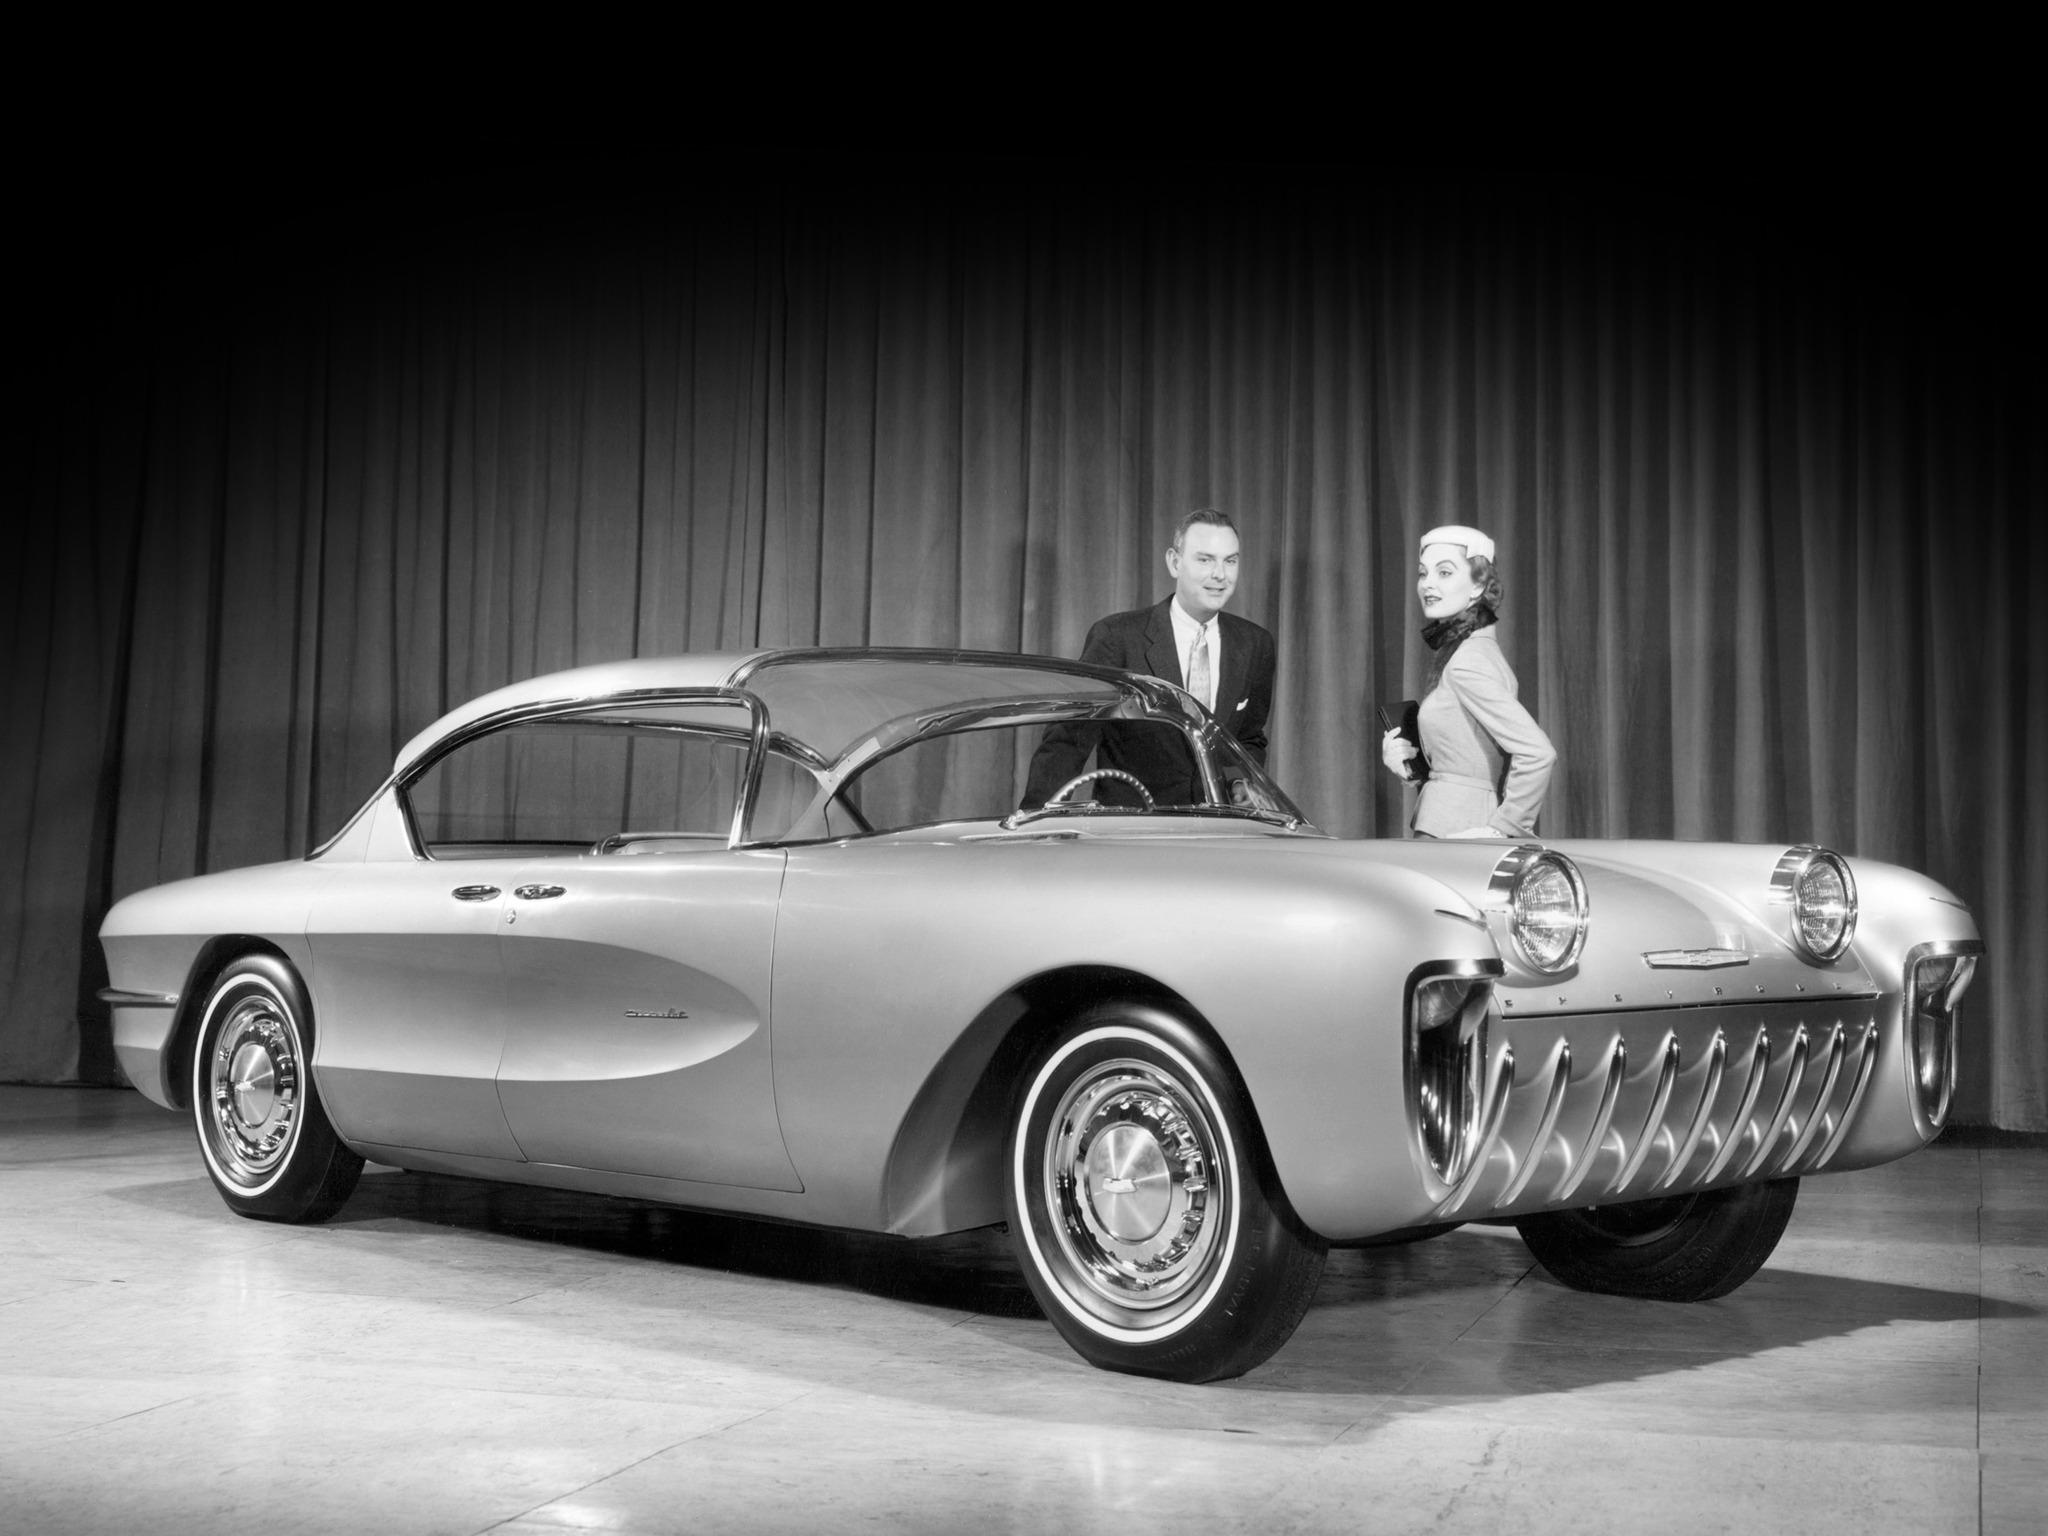 chevrolet biscayne concept car   concept cars